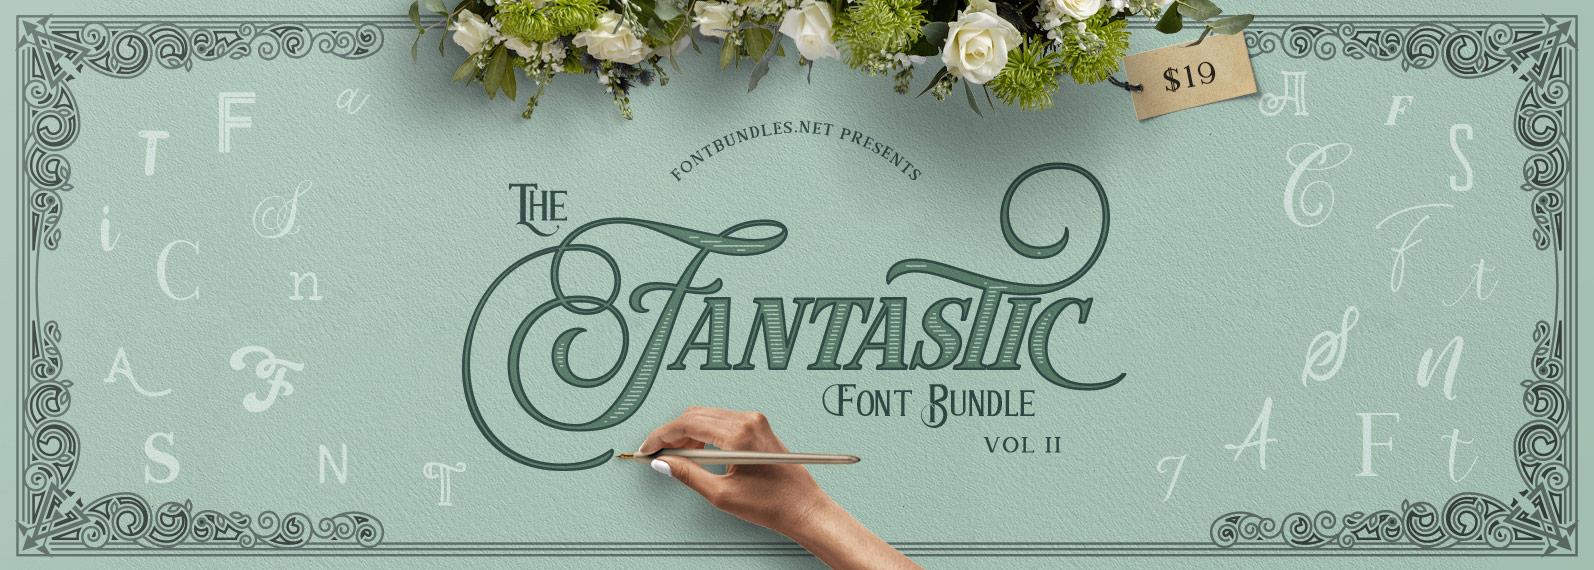 The Fantastic Font Bundle II Cover